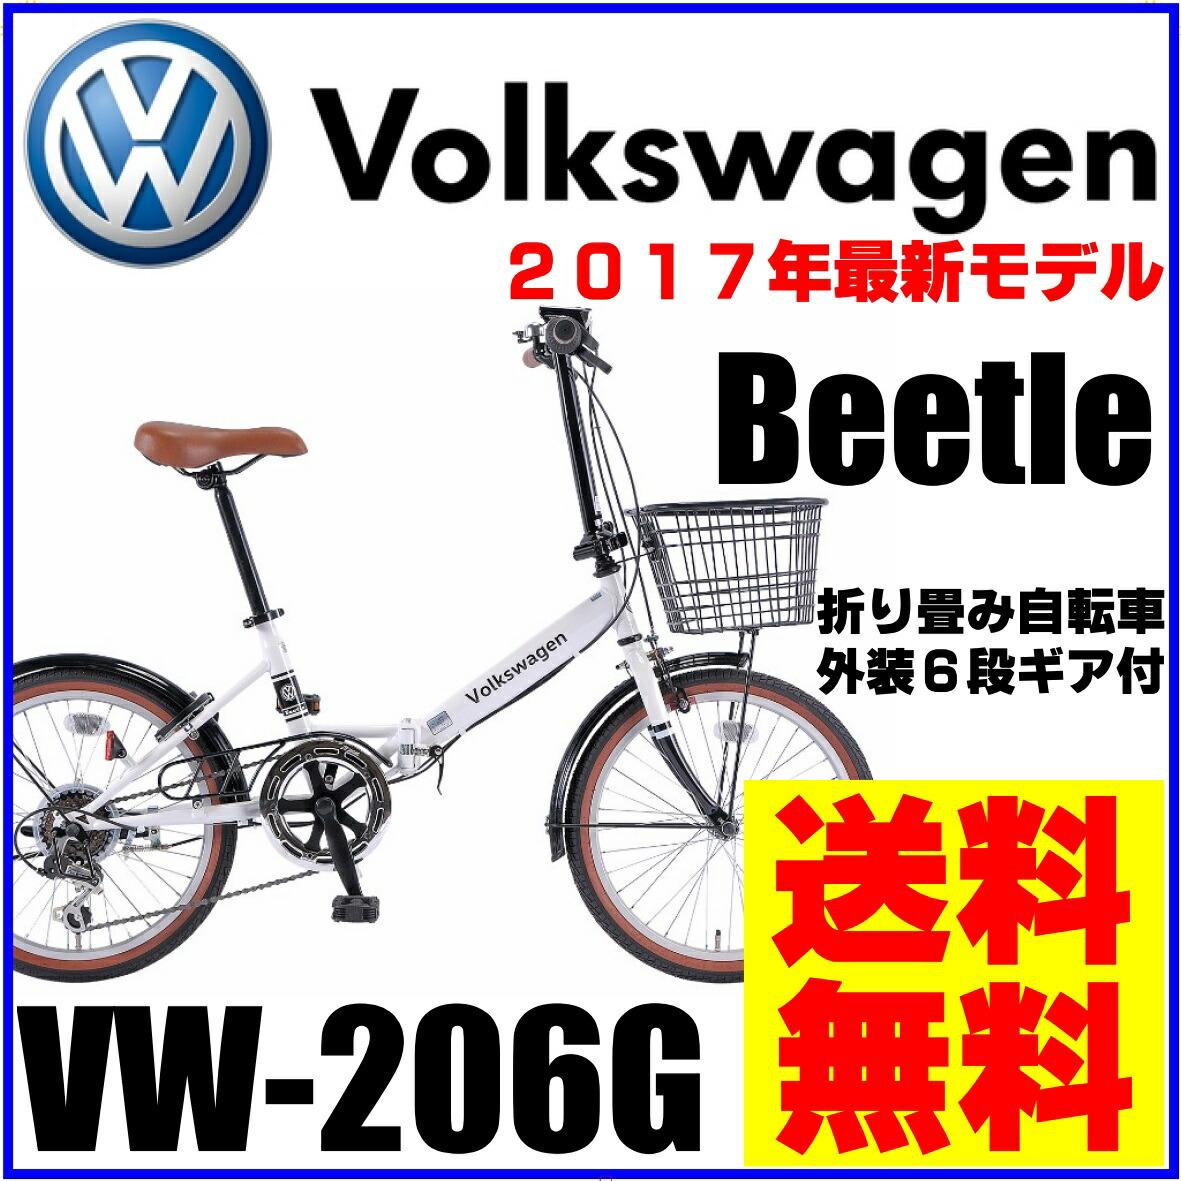 BAA 折りたたみ 自転車 フォルクスワーゲン Volkswagen 自転車 ホワイト 白 20インチ 自転車 外装6段ギア フォルクスワーゲン VW-206G Beetle ビートル